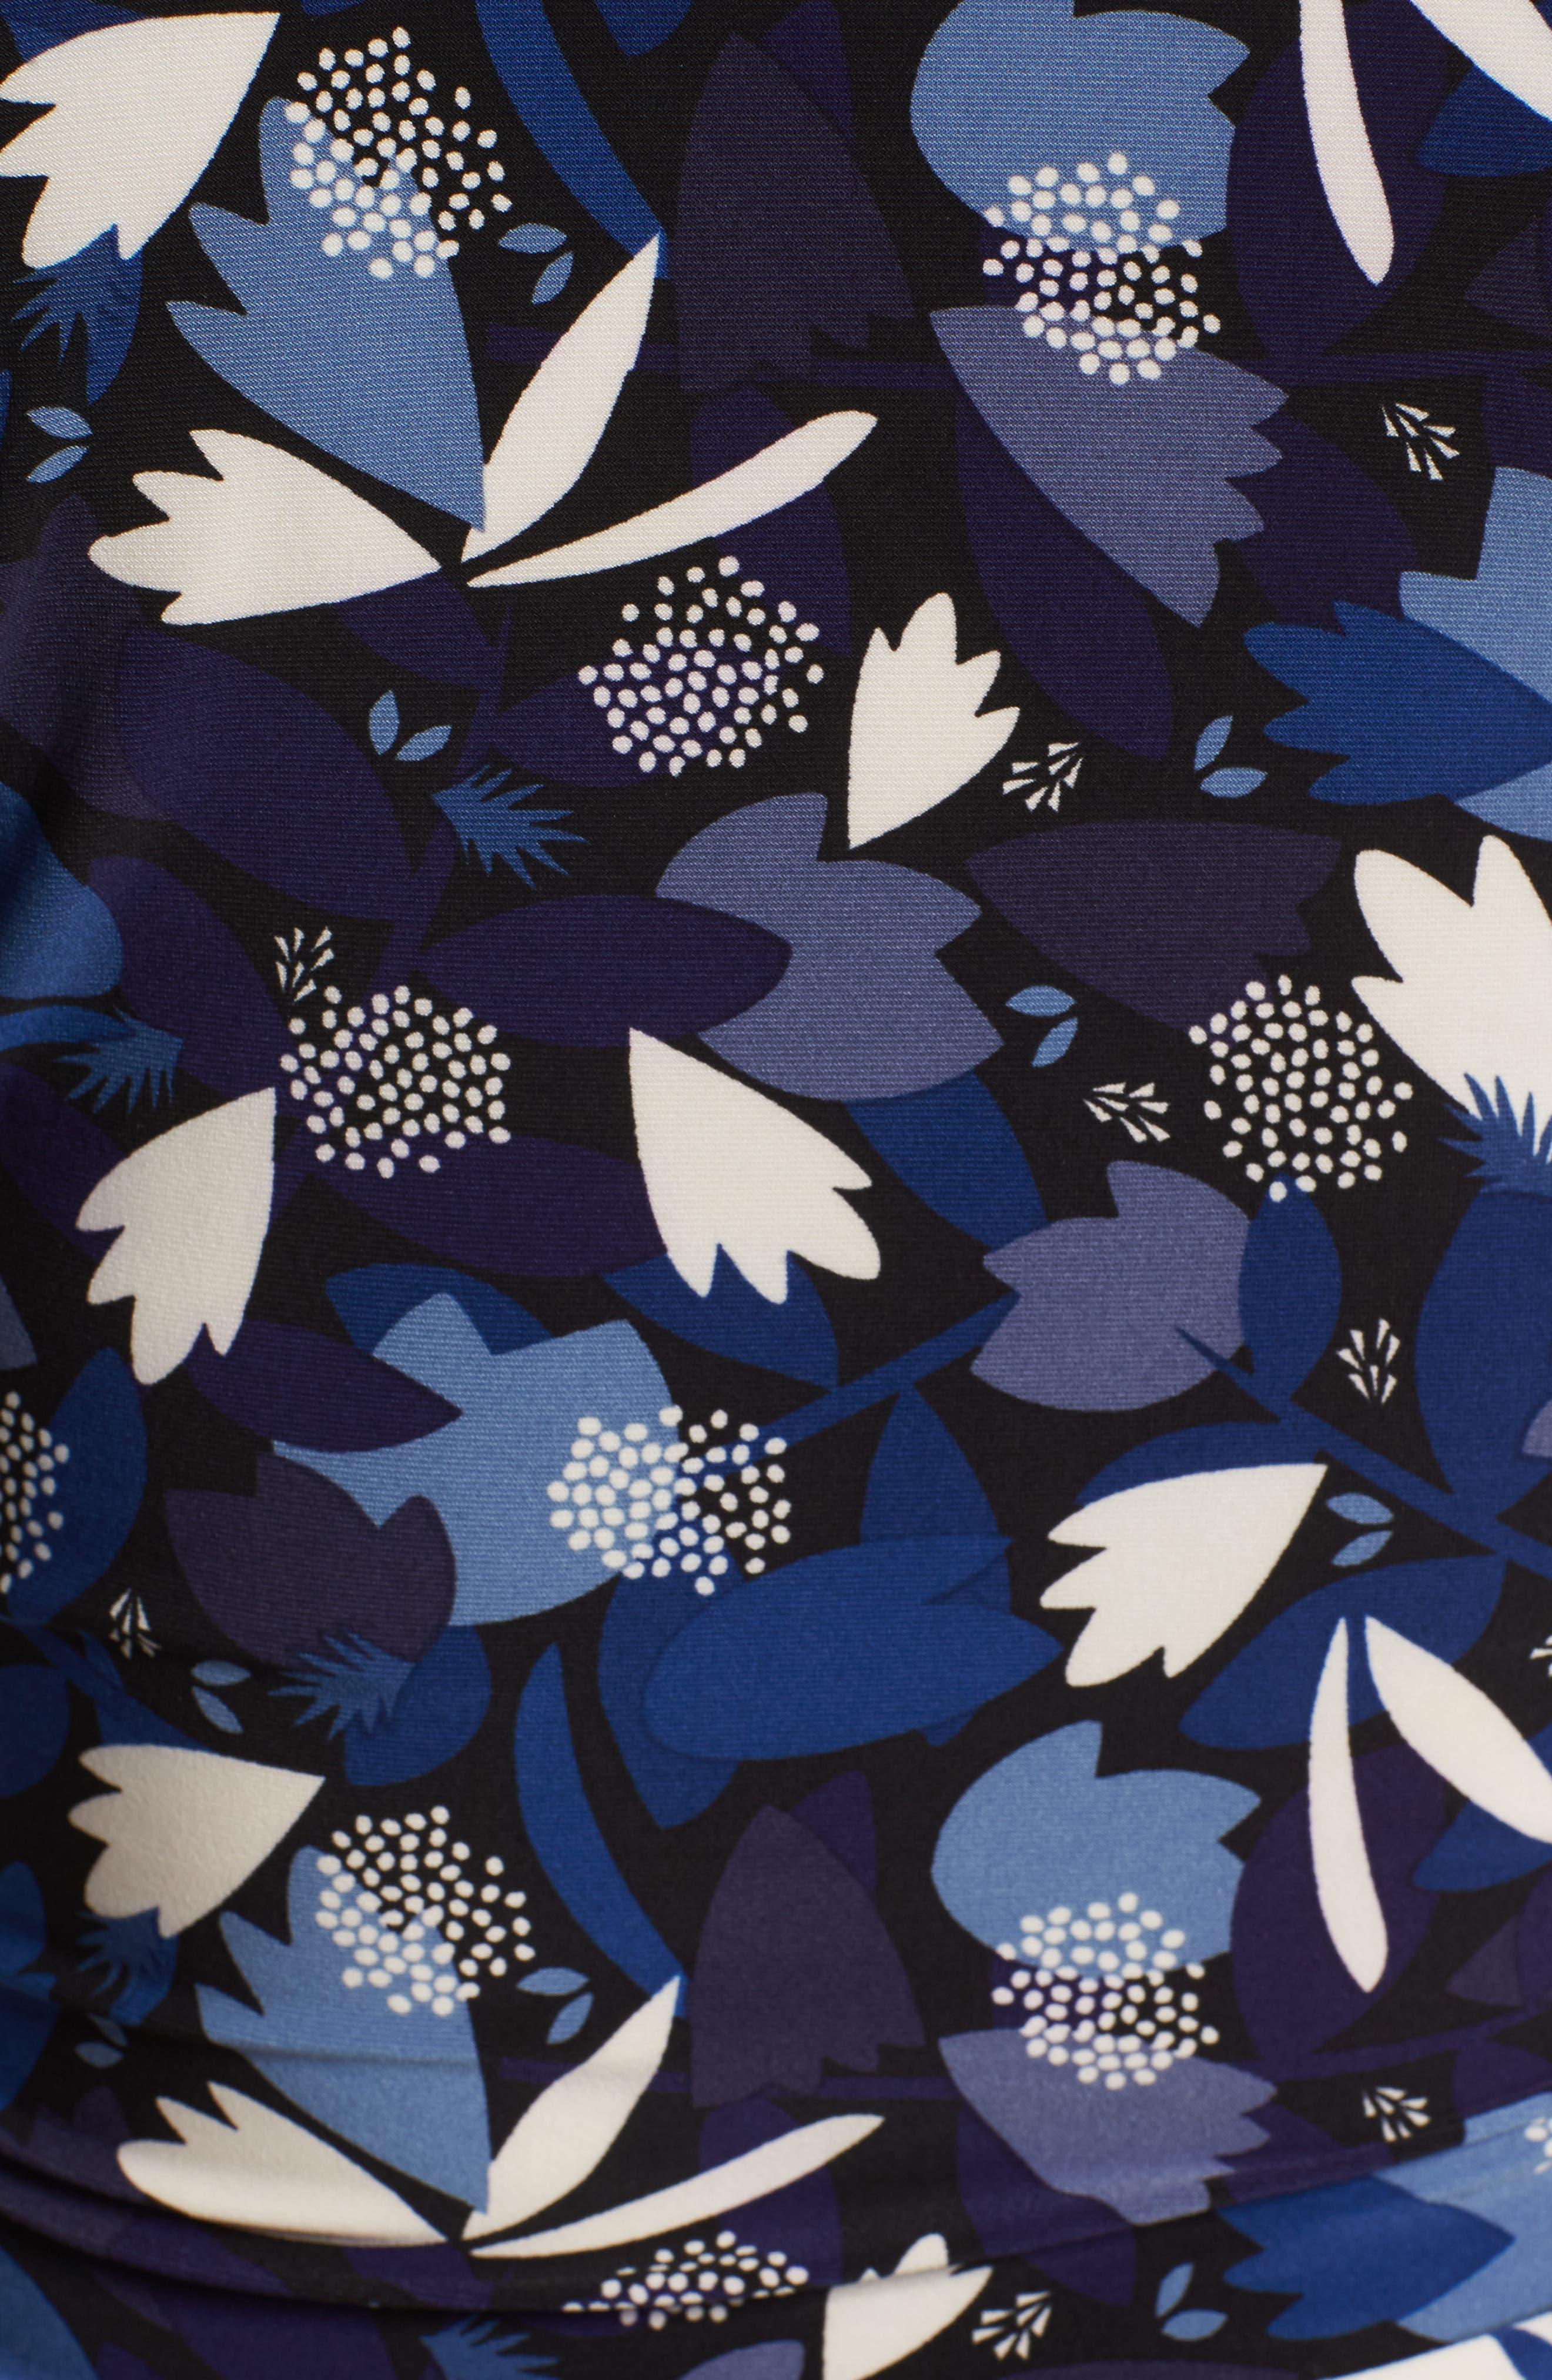 Amalfi Print Faux Wrap Top,                             Alternate thumbnail 6, color,                             Black/ Monaco Combo